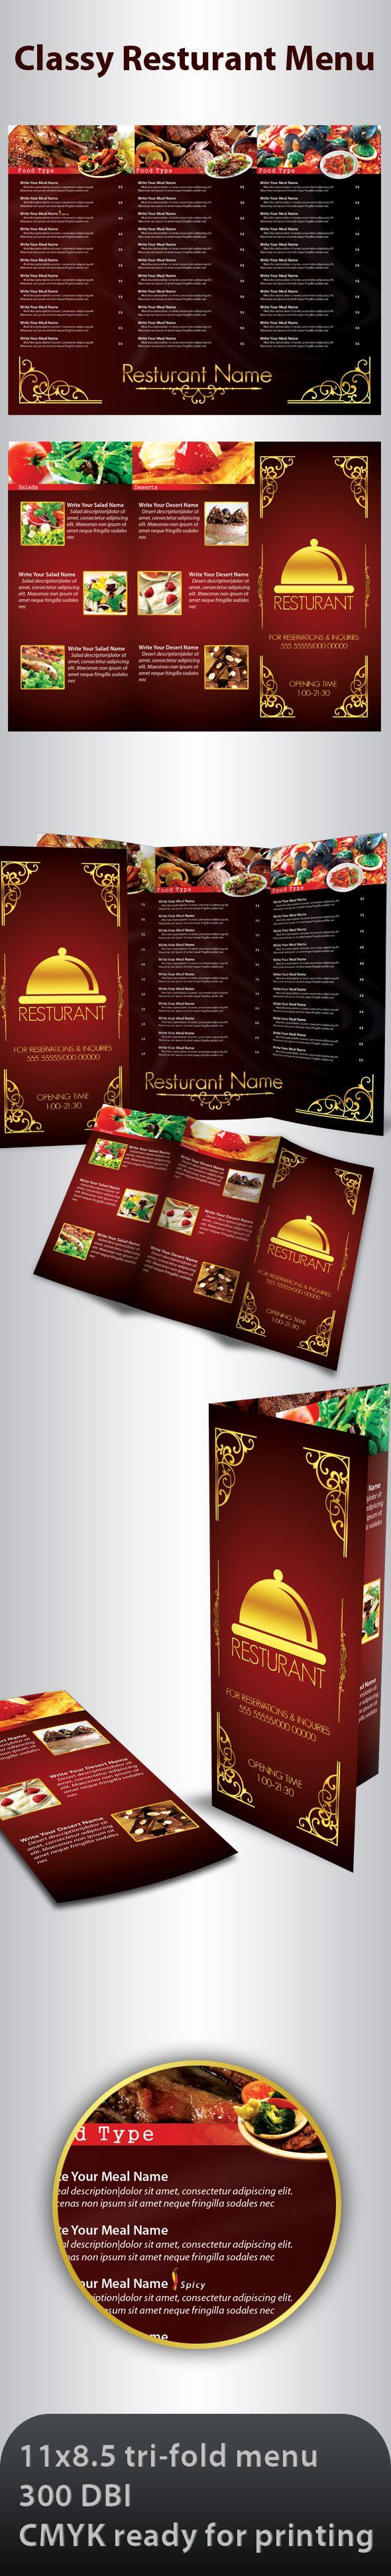 Classy Resturant Menu by ~Advero on deviantART  http://www.techirsh.com